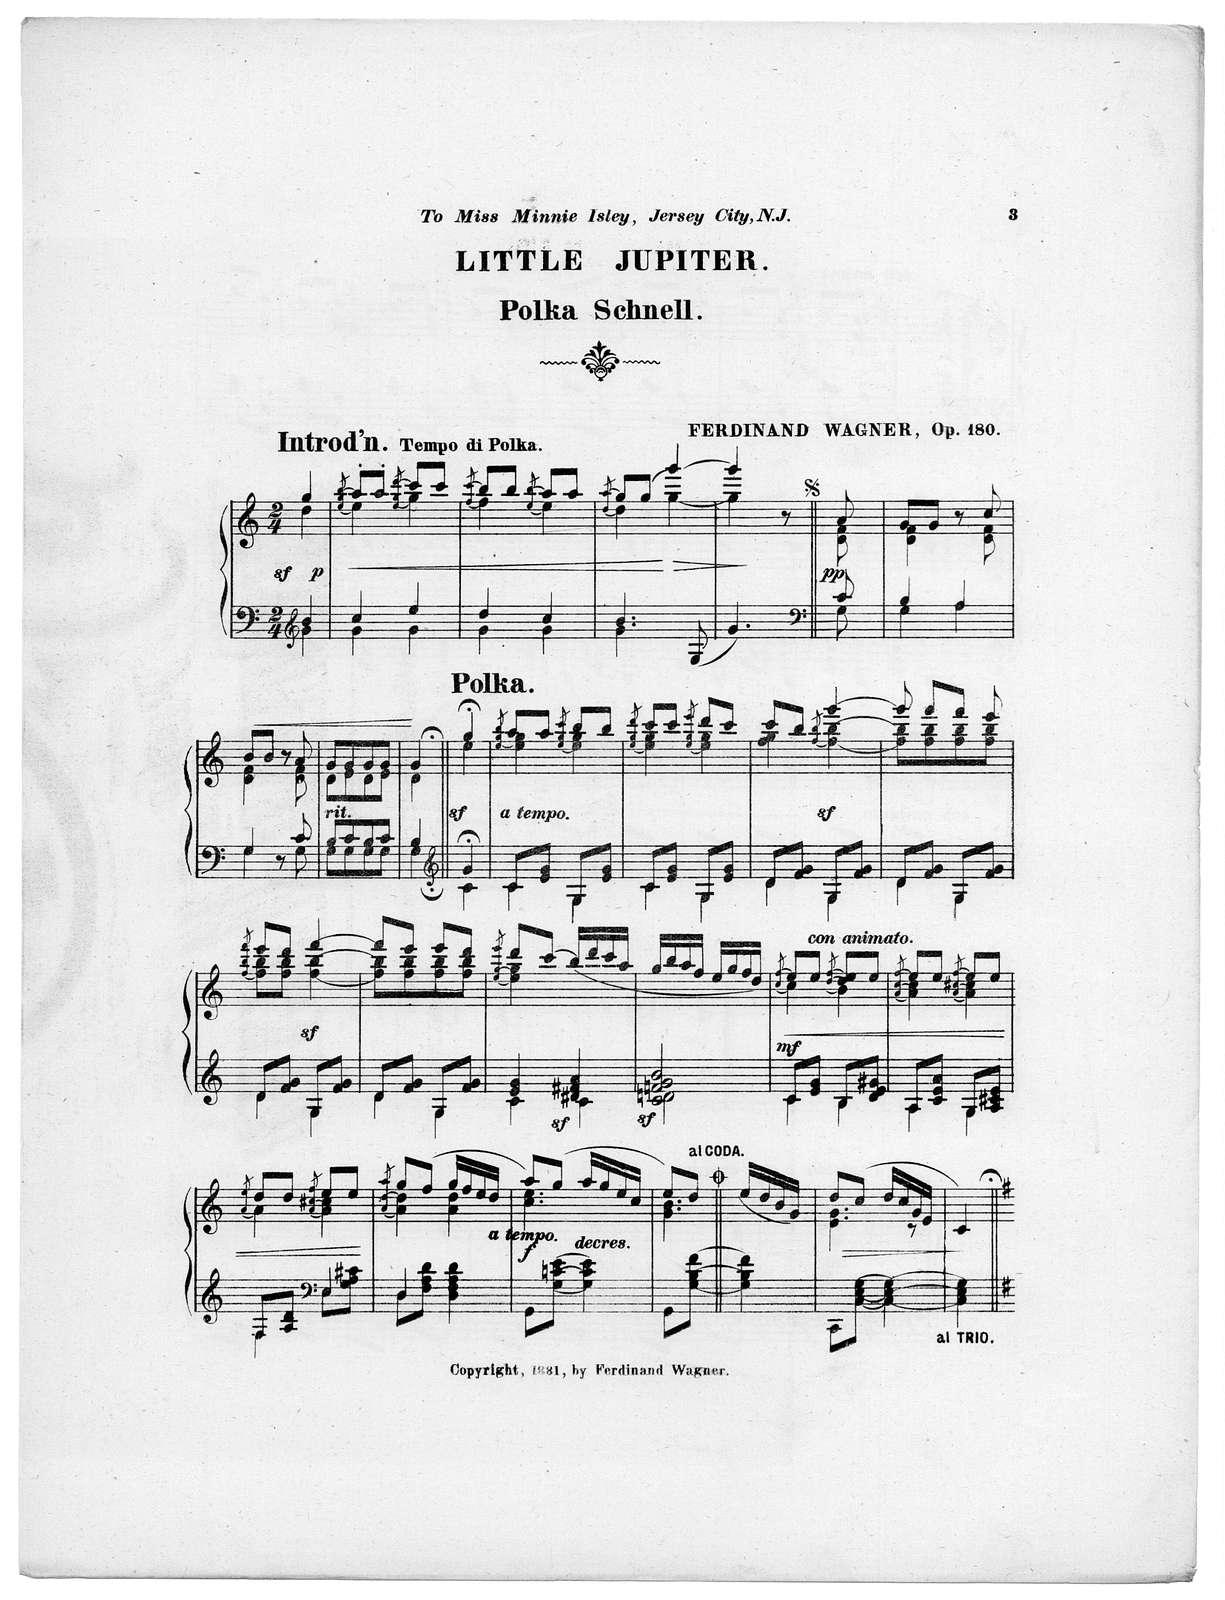 Little Jupiter, op. 180